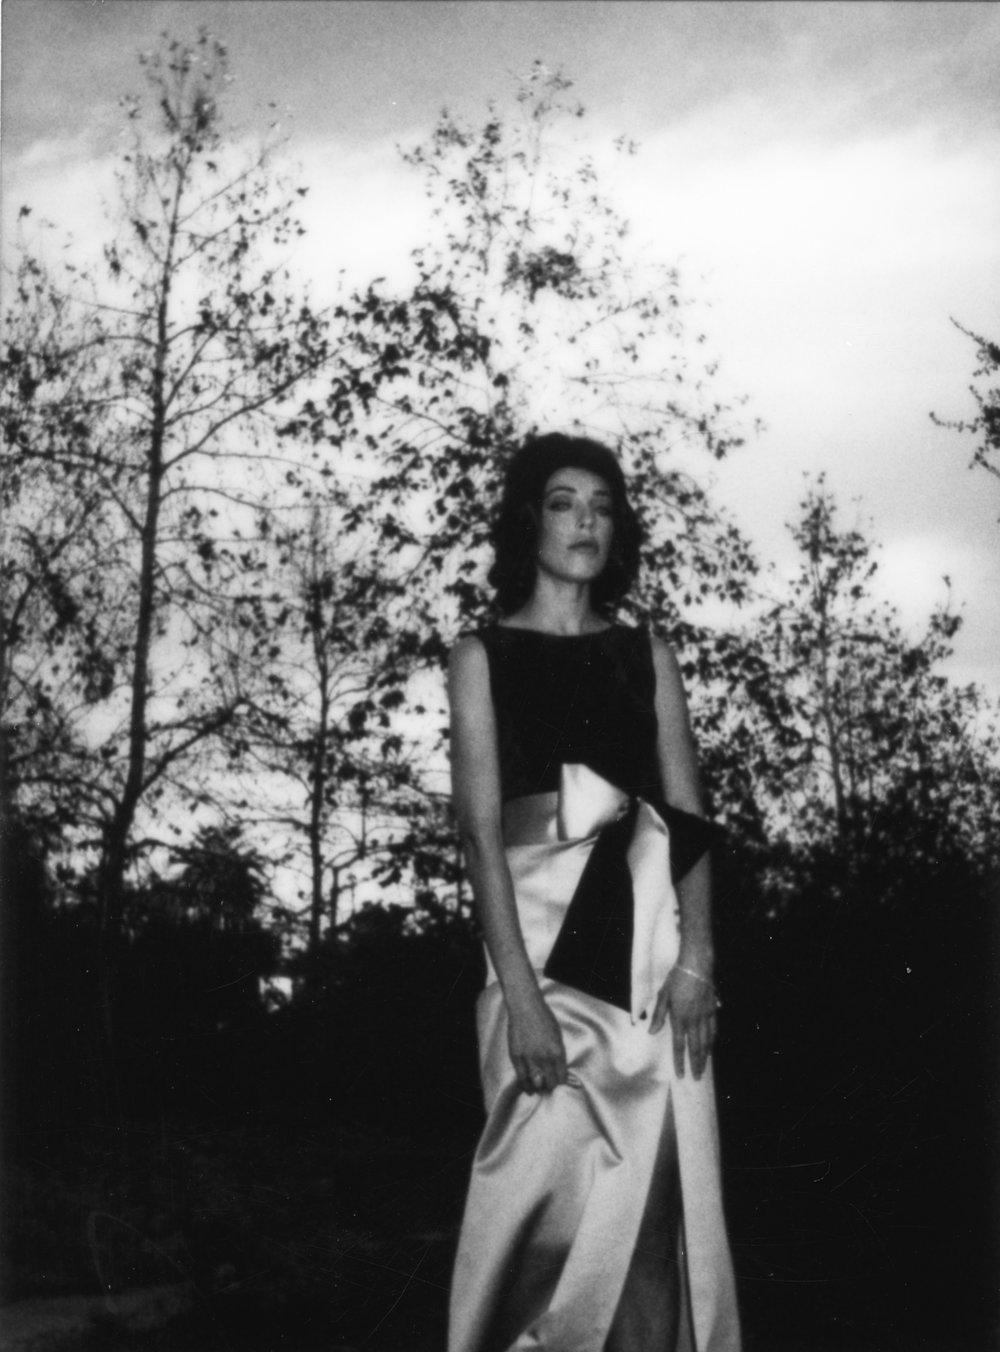 Arlington_PolaroidScan_13.jpg